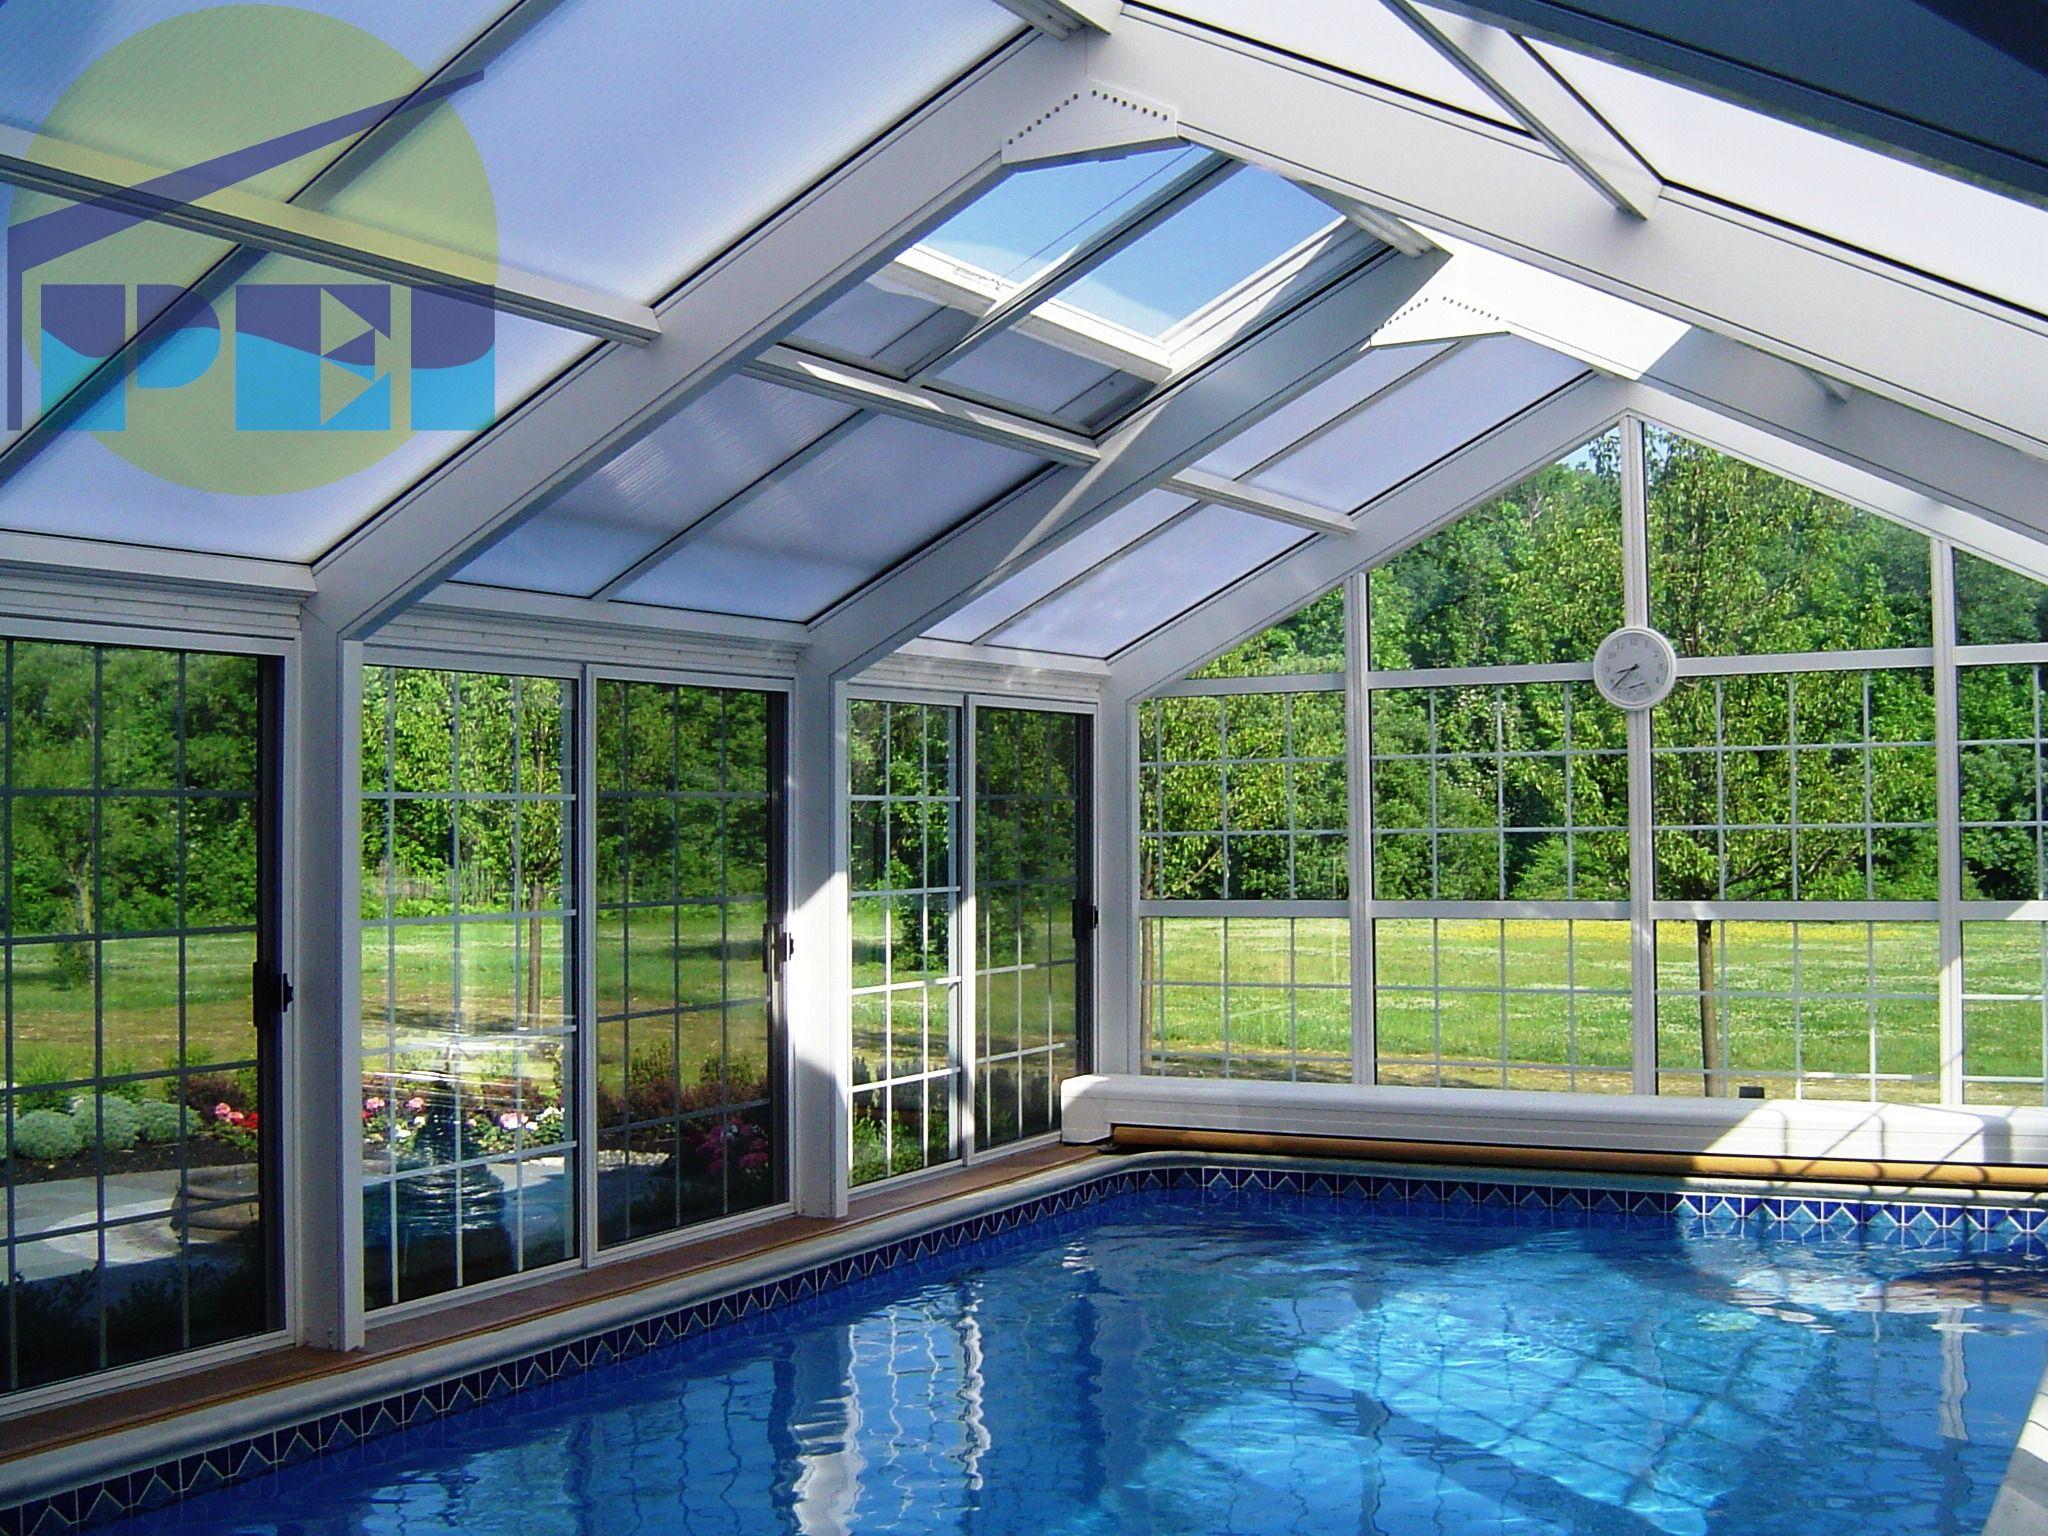 Indoor pool enclosures pool enclosure interior remodel pinterest and for Indoor swimming pool building regulations